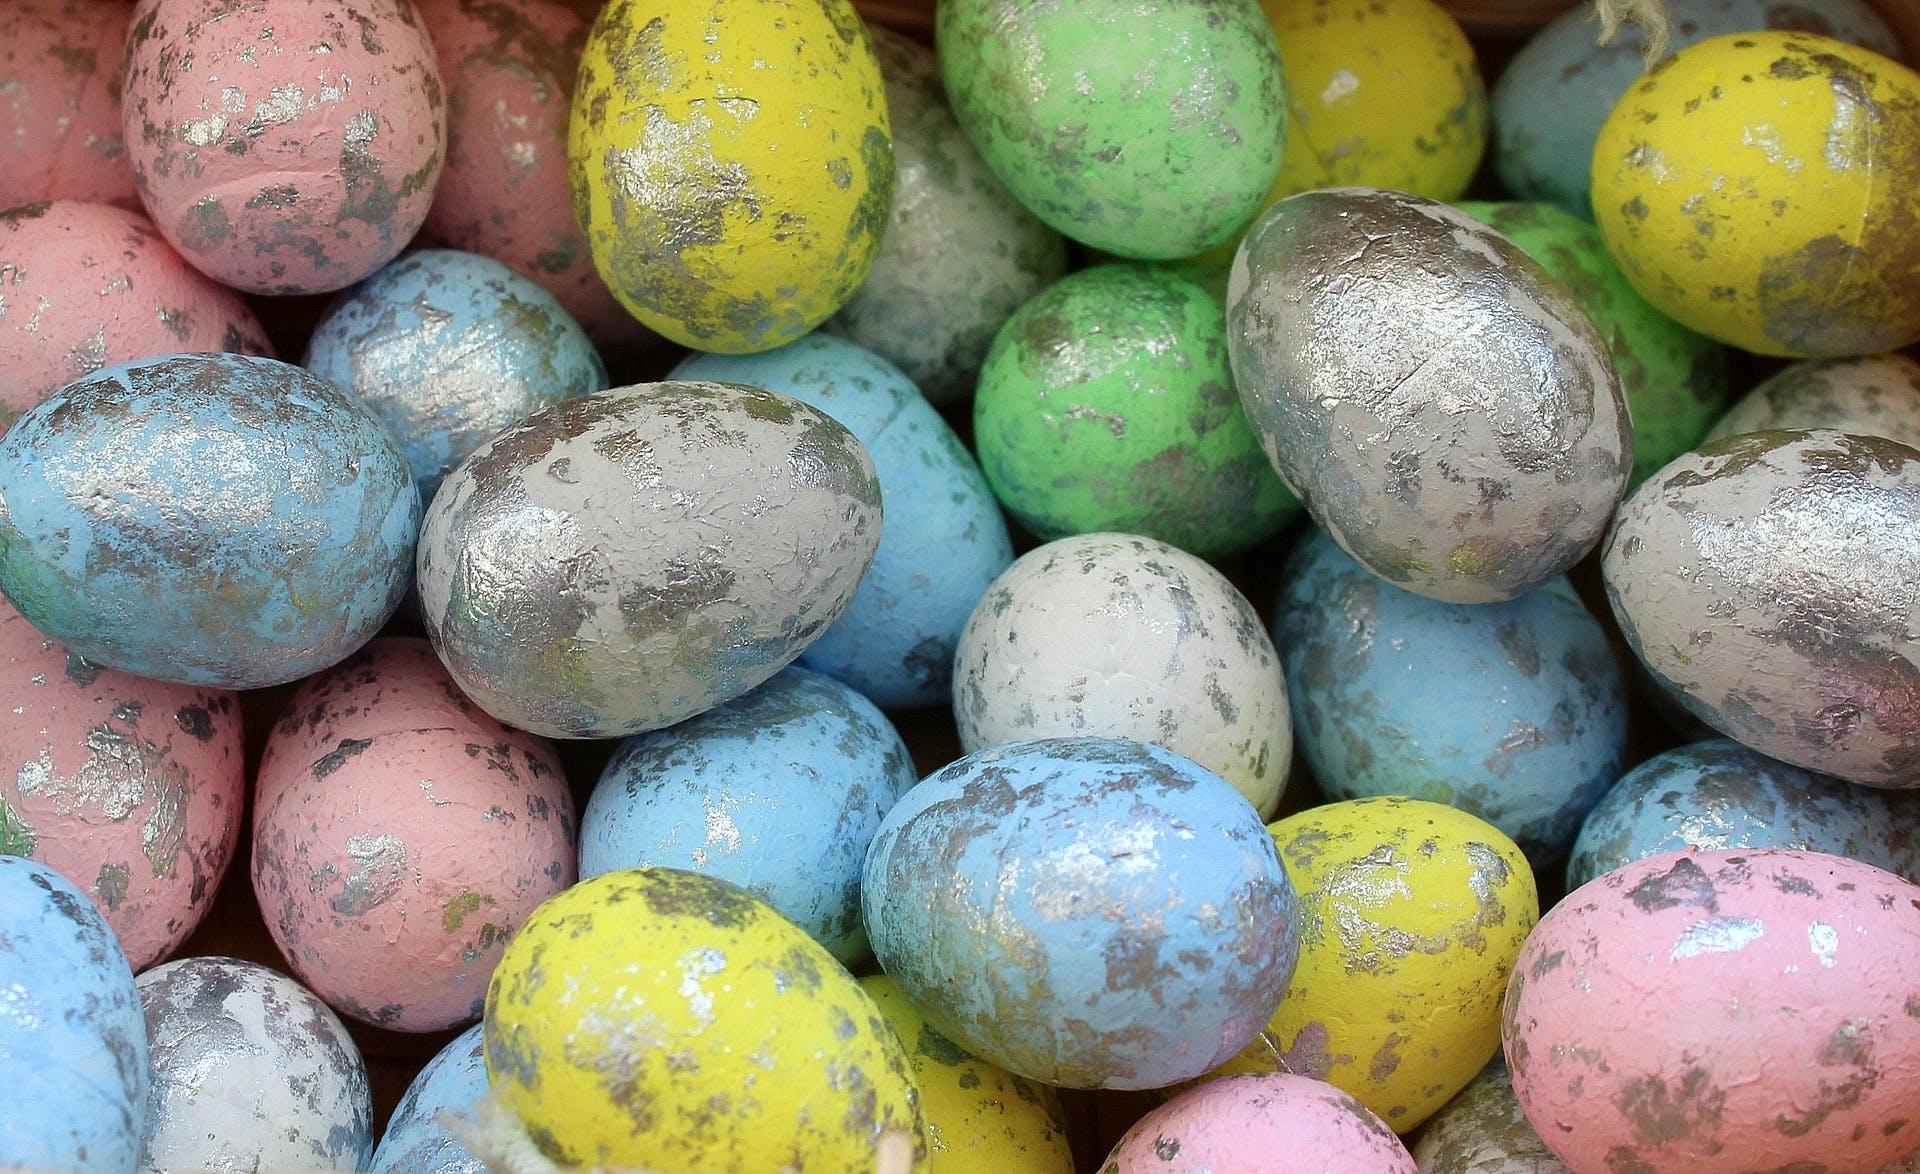 eggs-3241148_1920